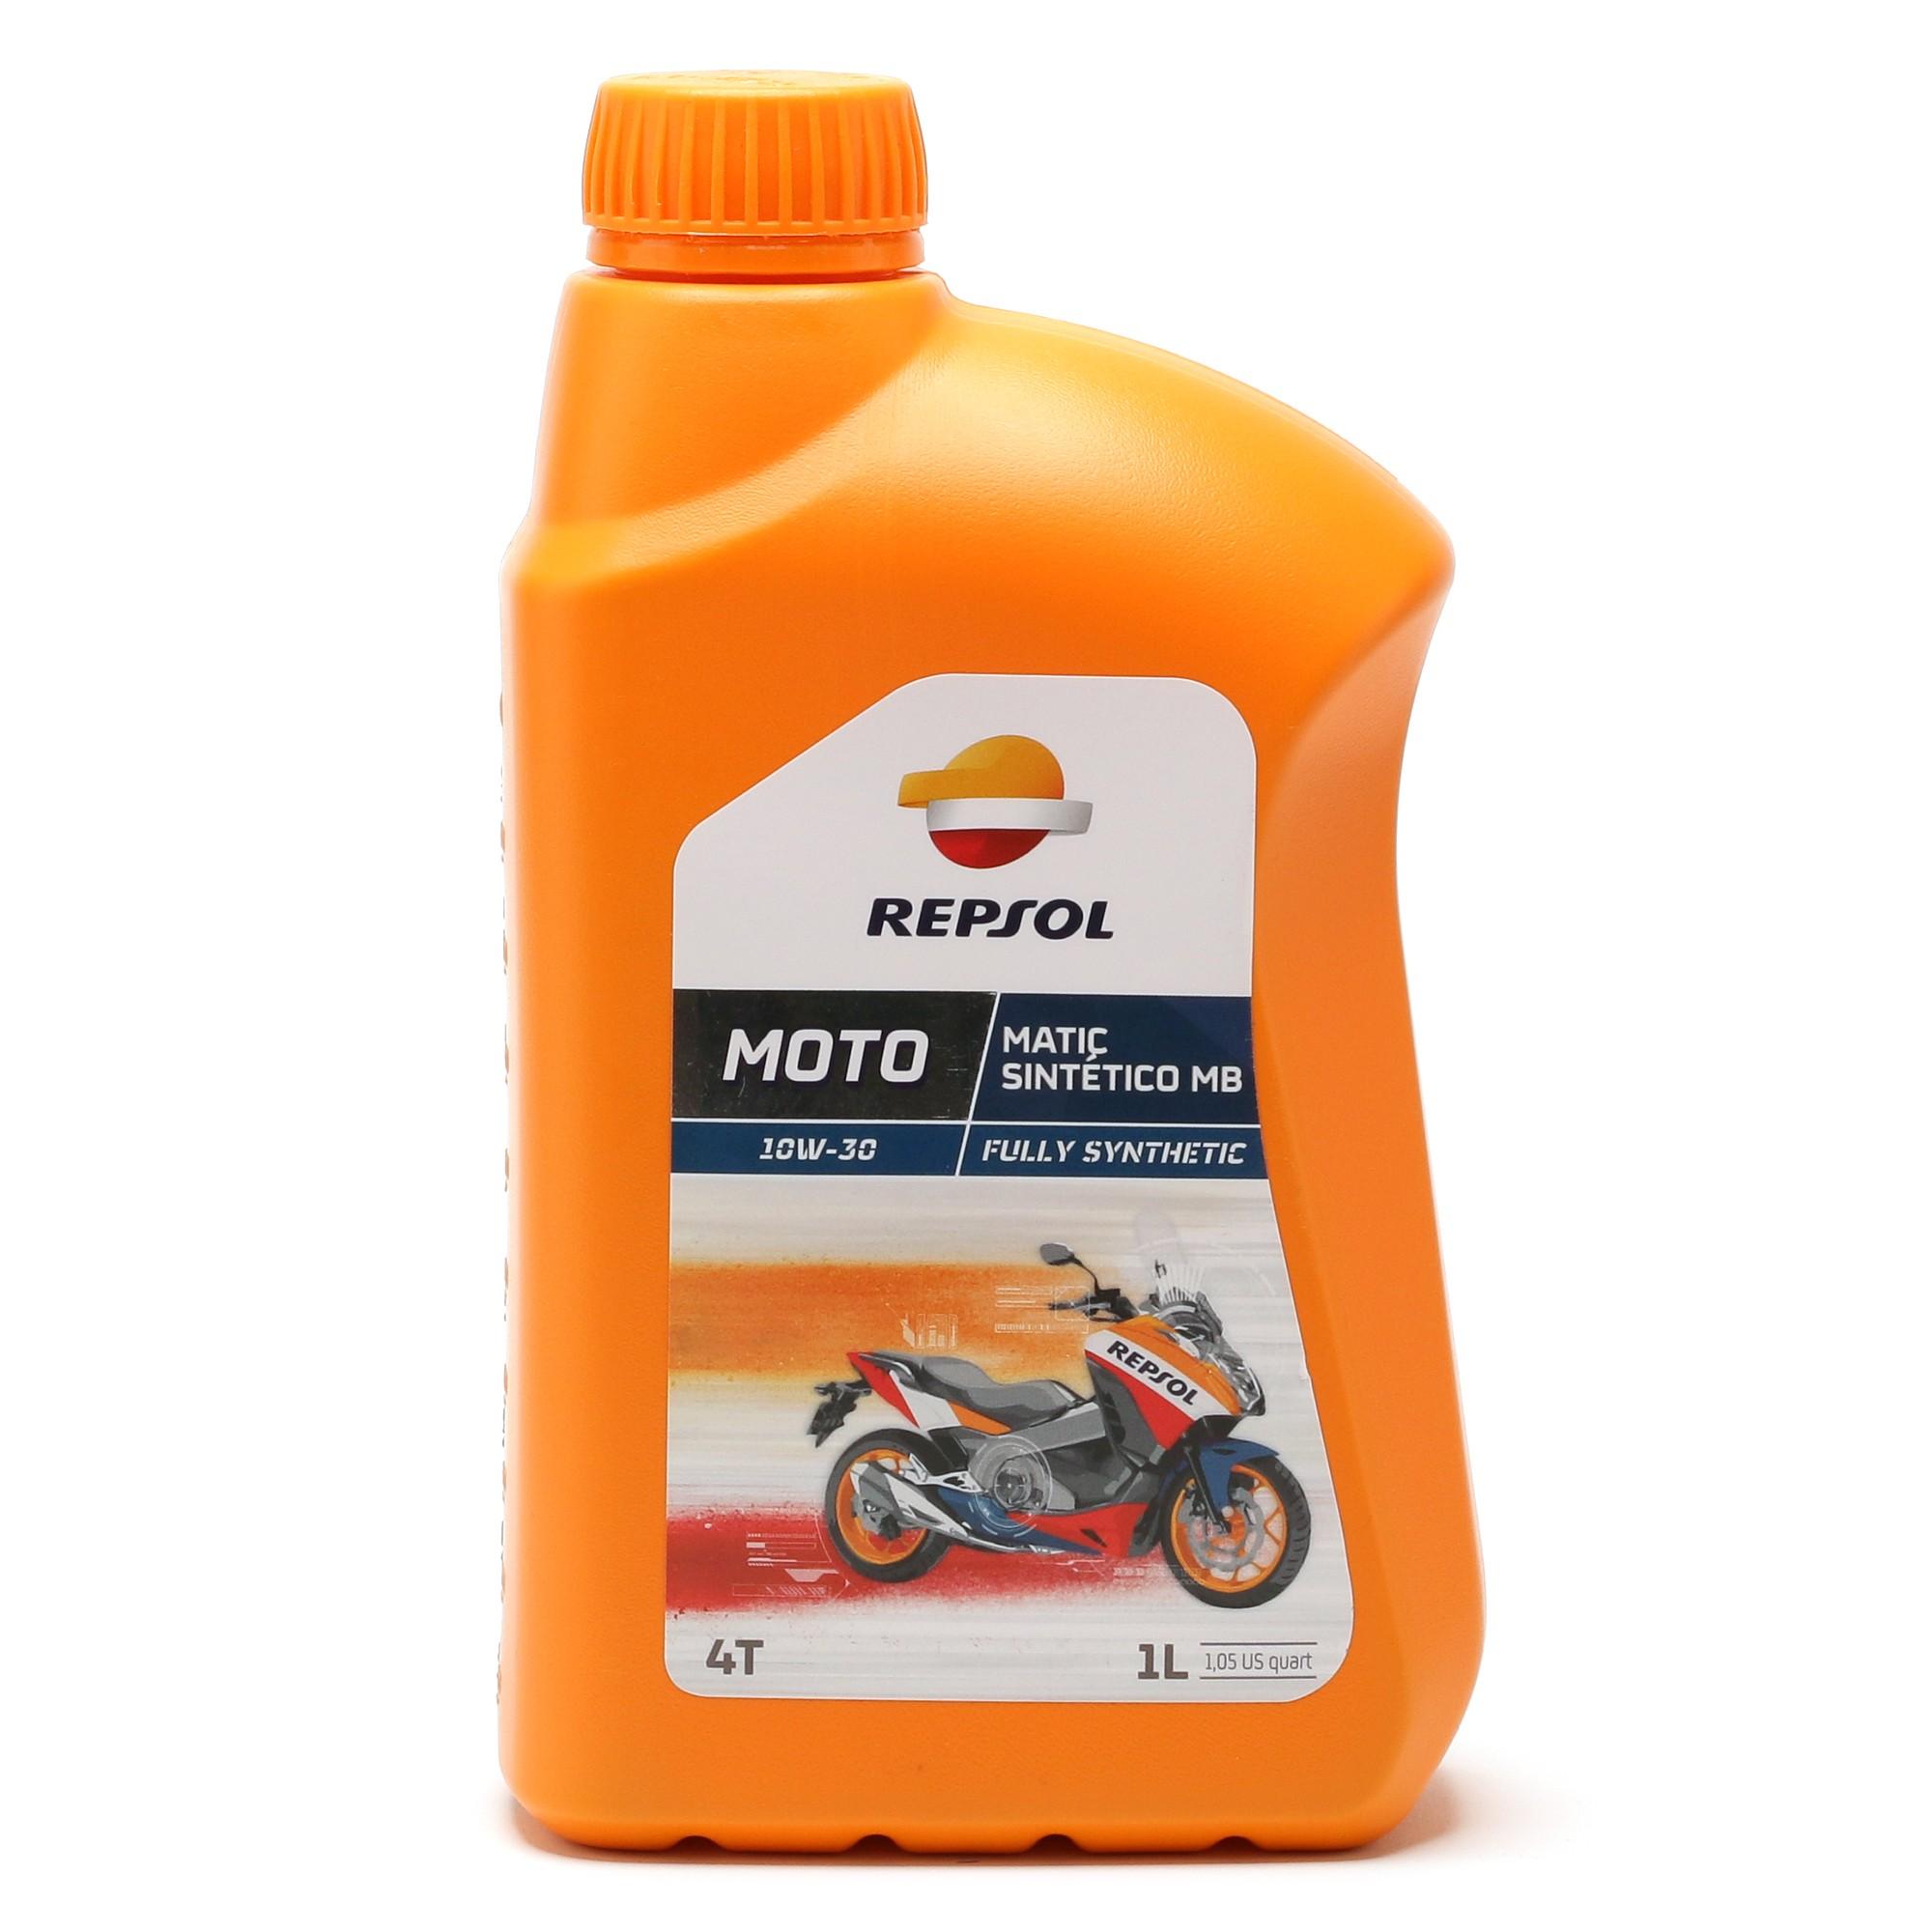 Repsol Motorrad Motoröl MOTO MATIC SINTETICO MB 4T 10W30 1 Liter